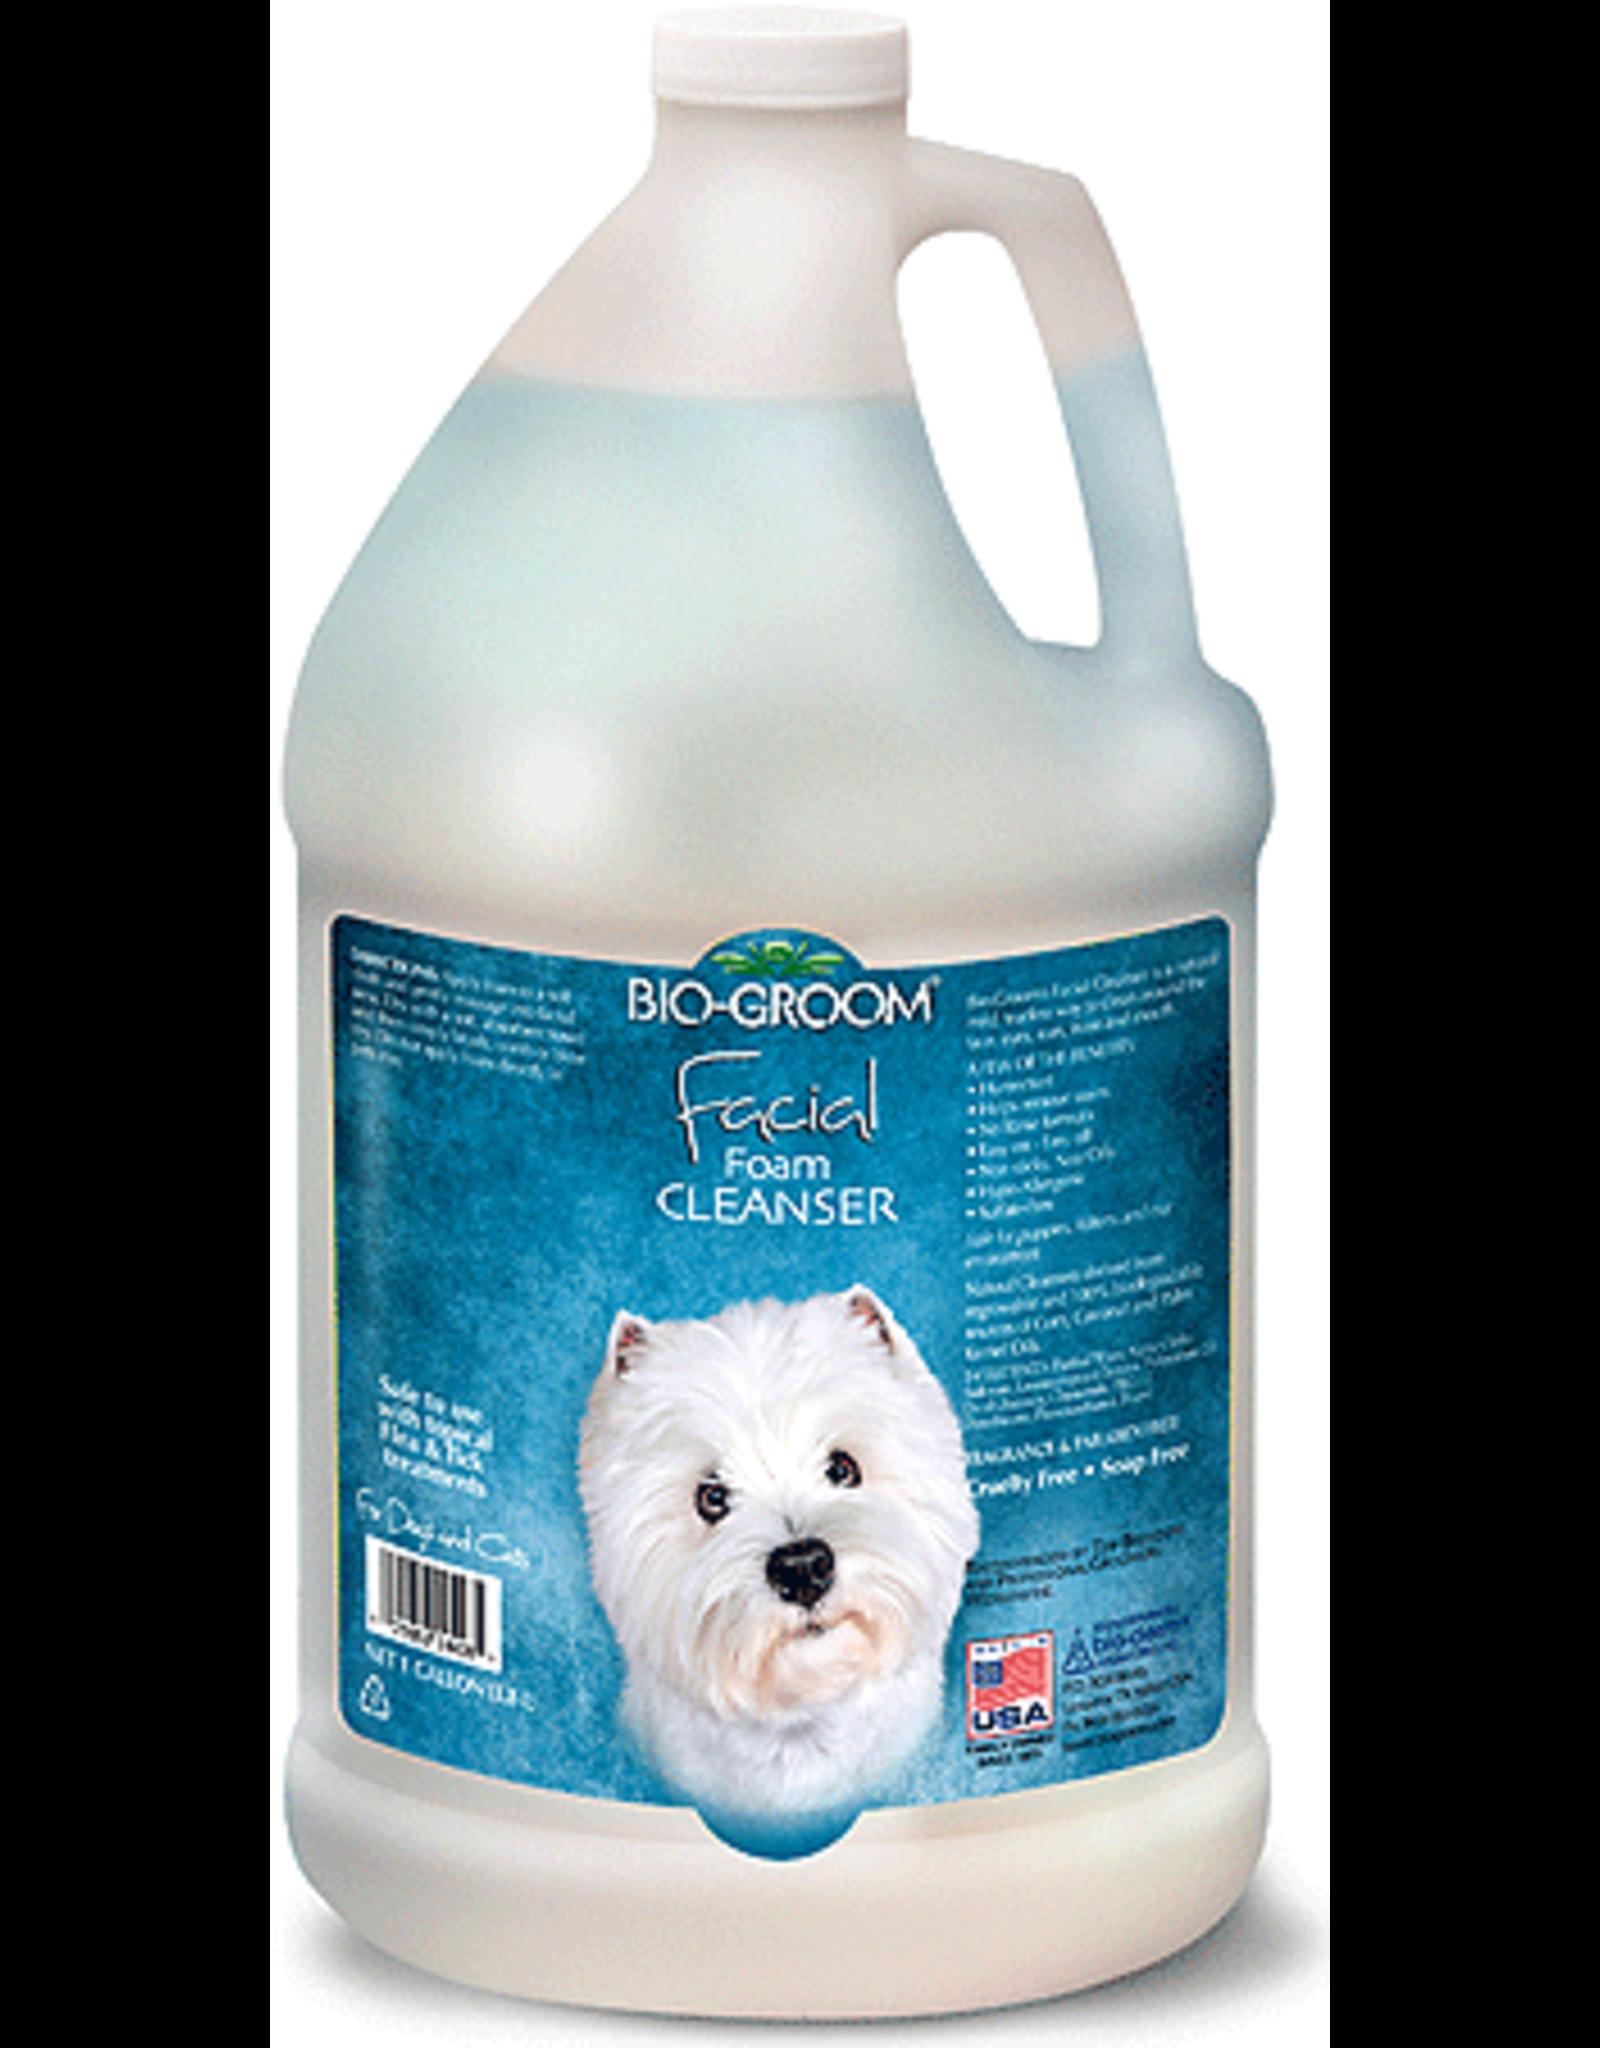 Biogroom BIOGROOM Facial Foam Cleanser G